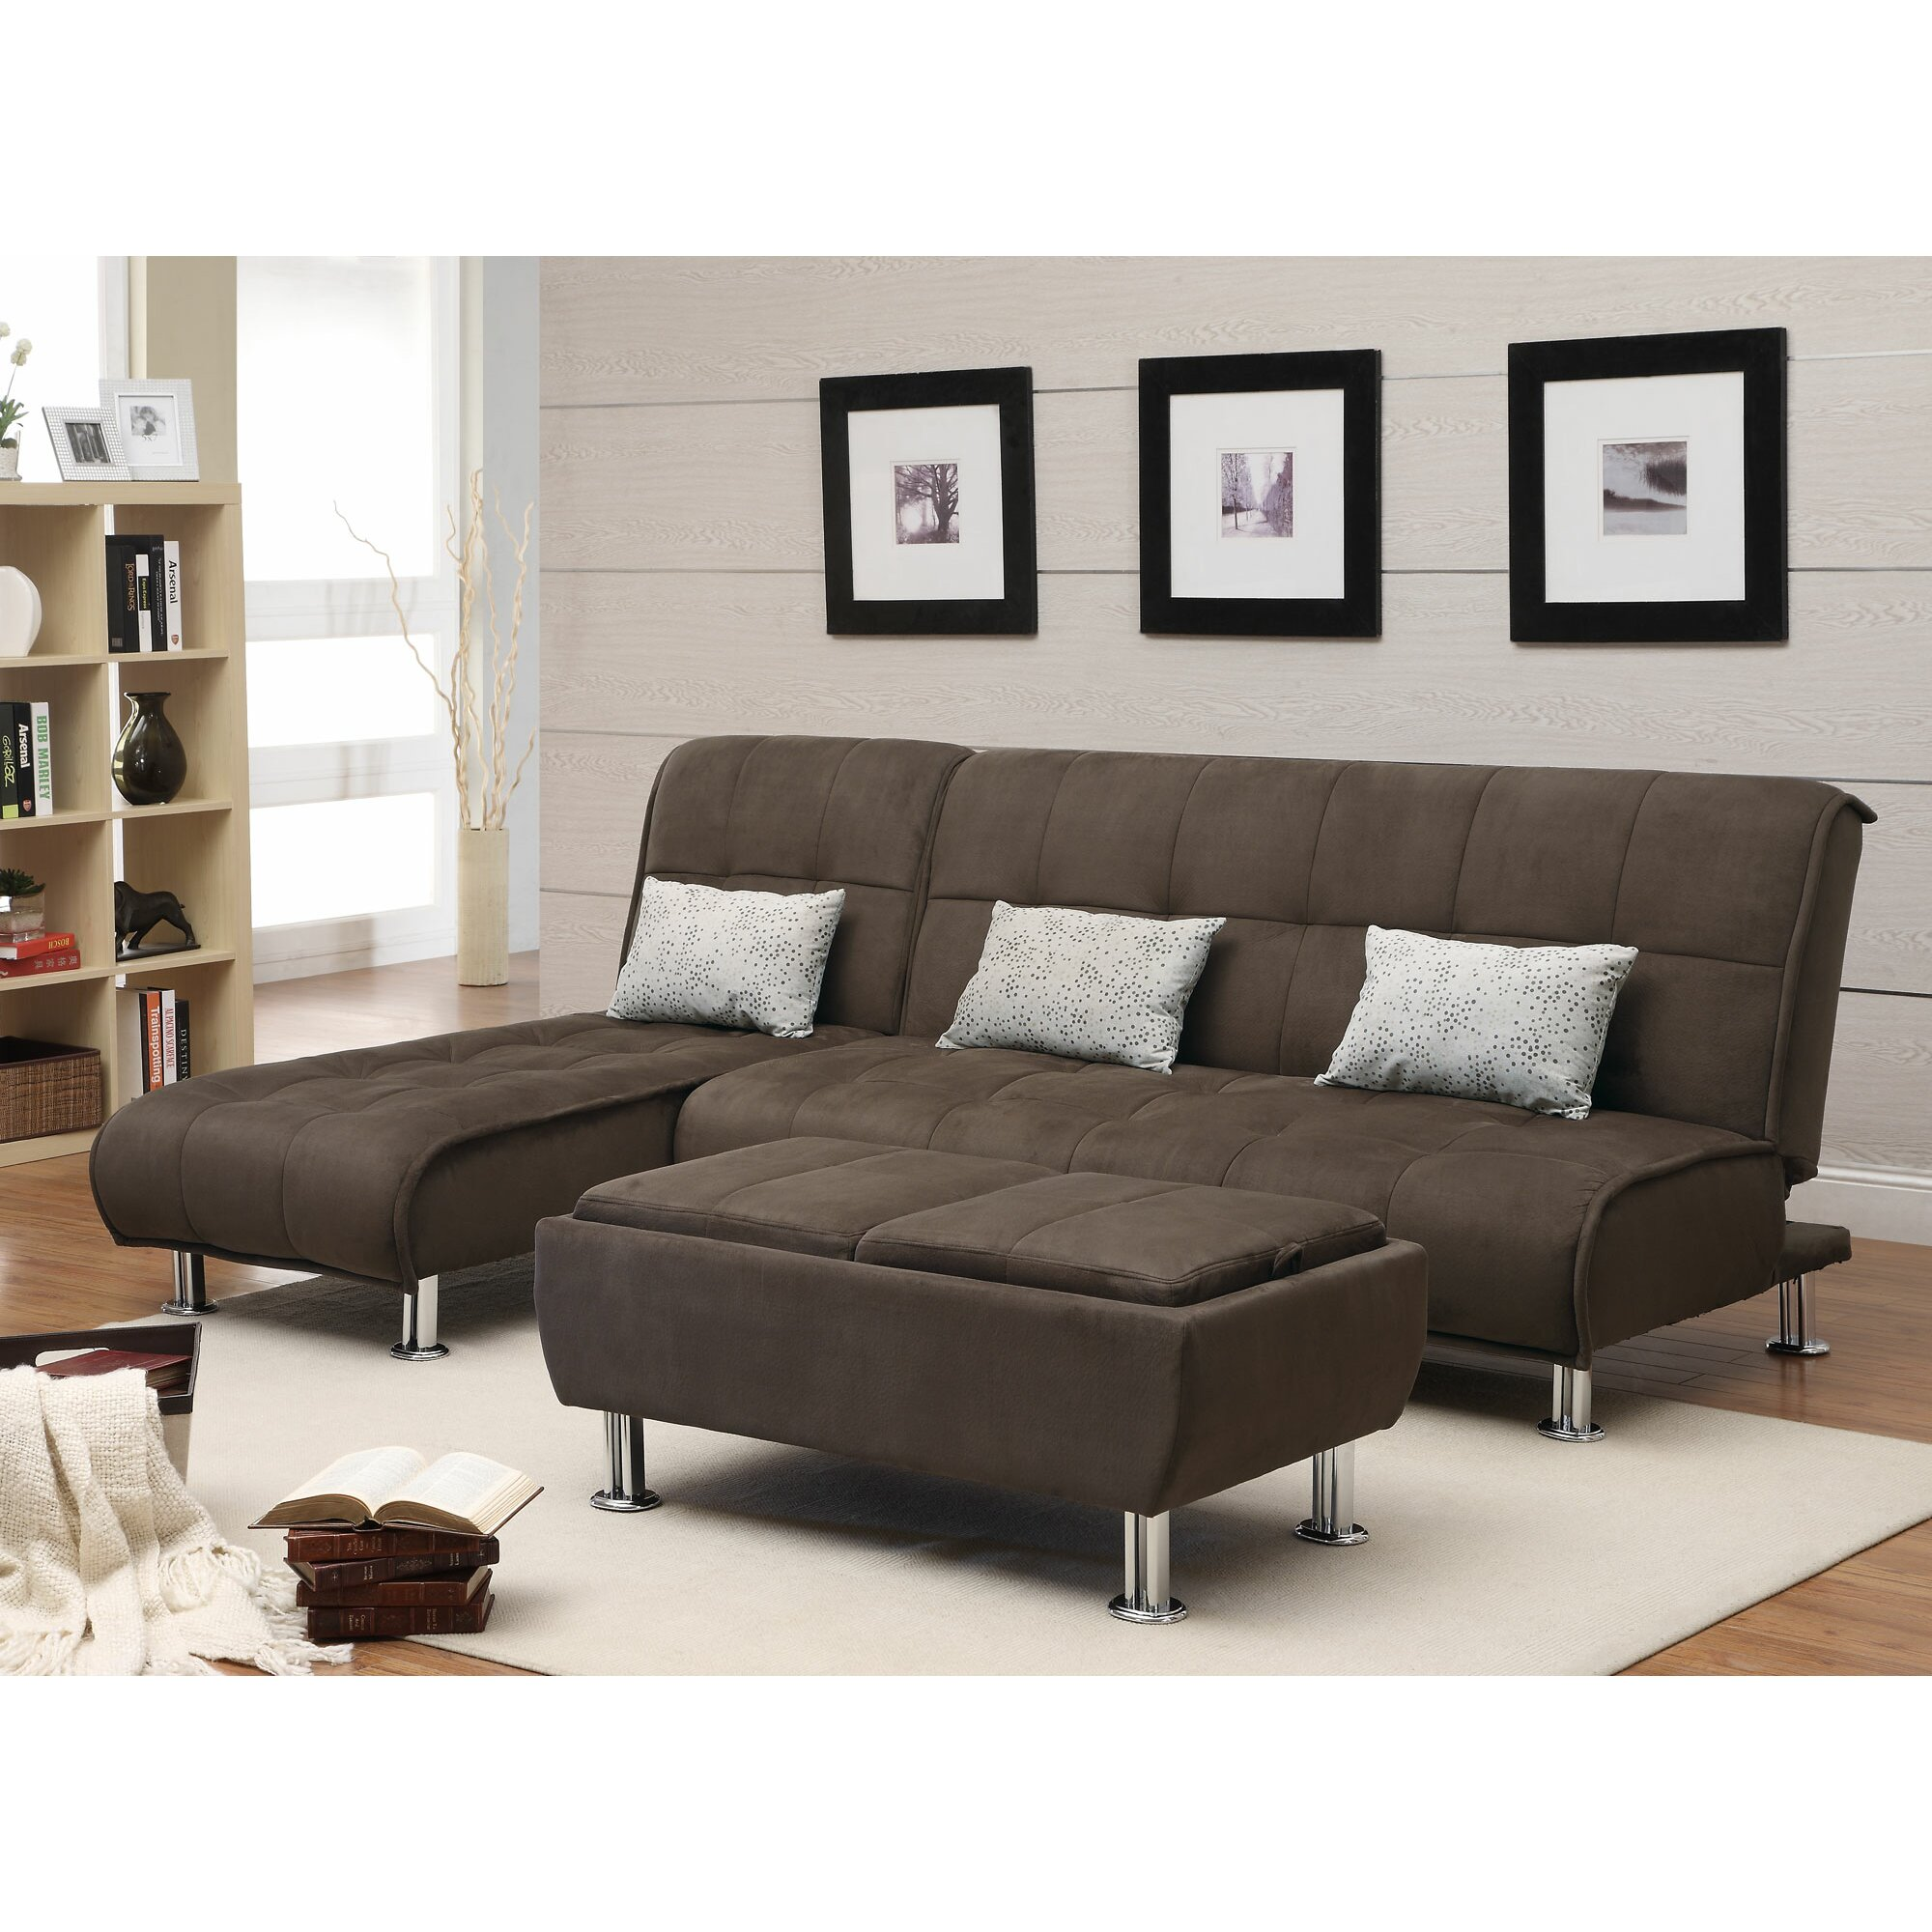 Sleeper sofa living room collection